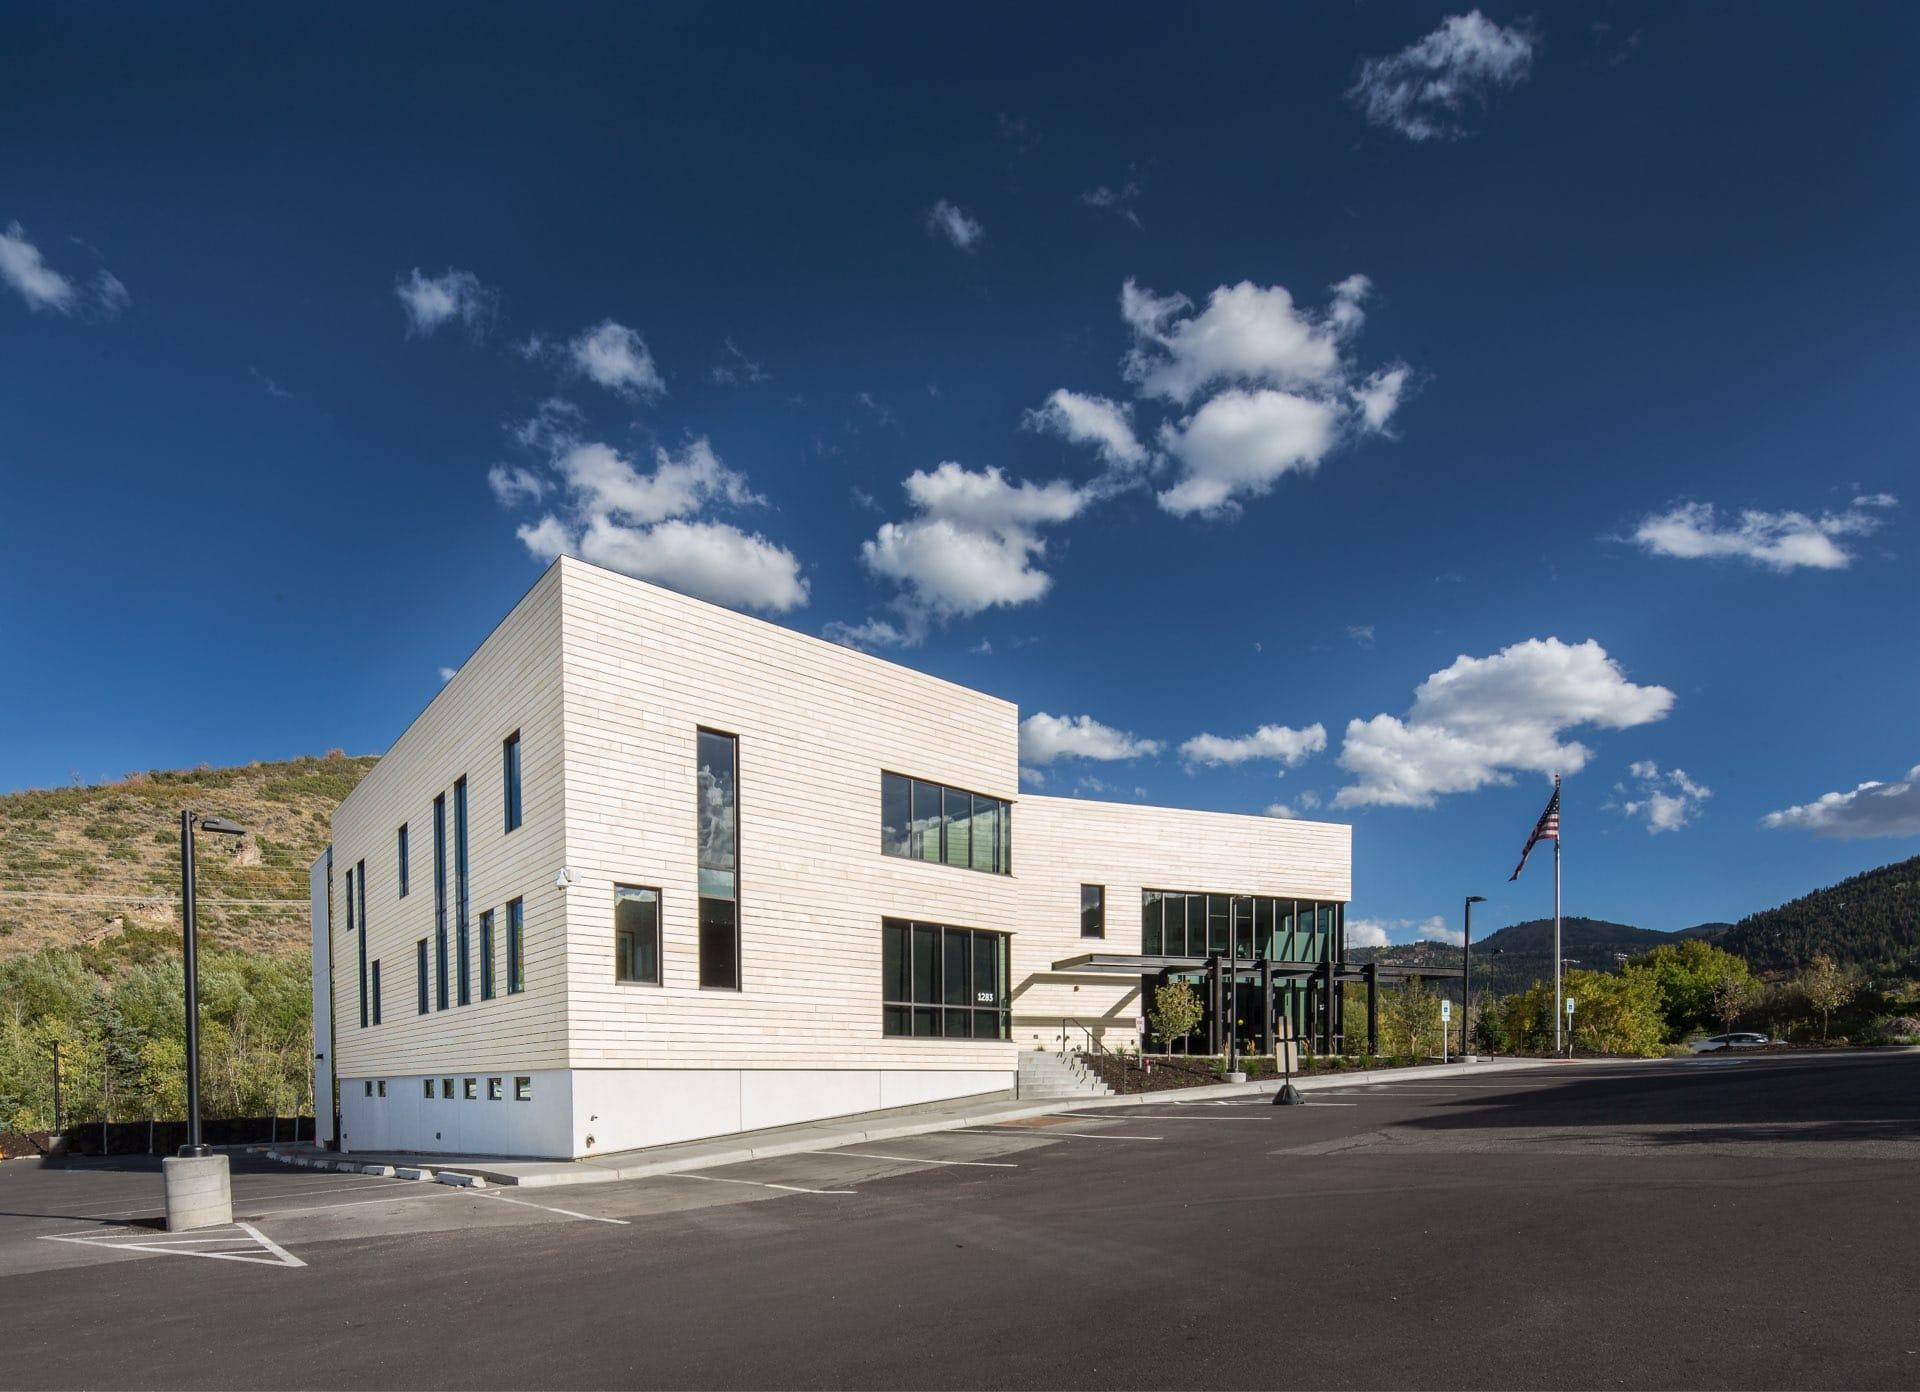 Christian Center of Park City, architectural design by Elliott Workgroup